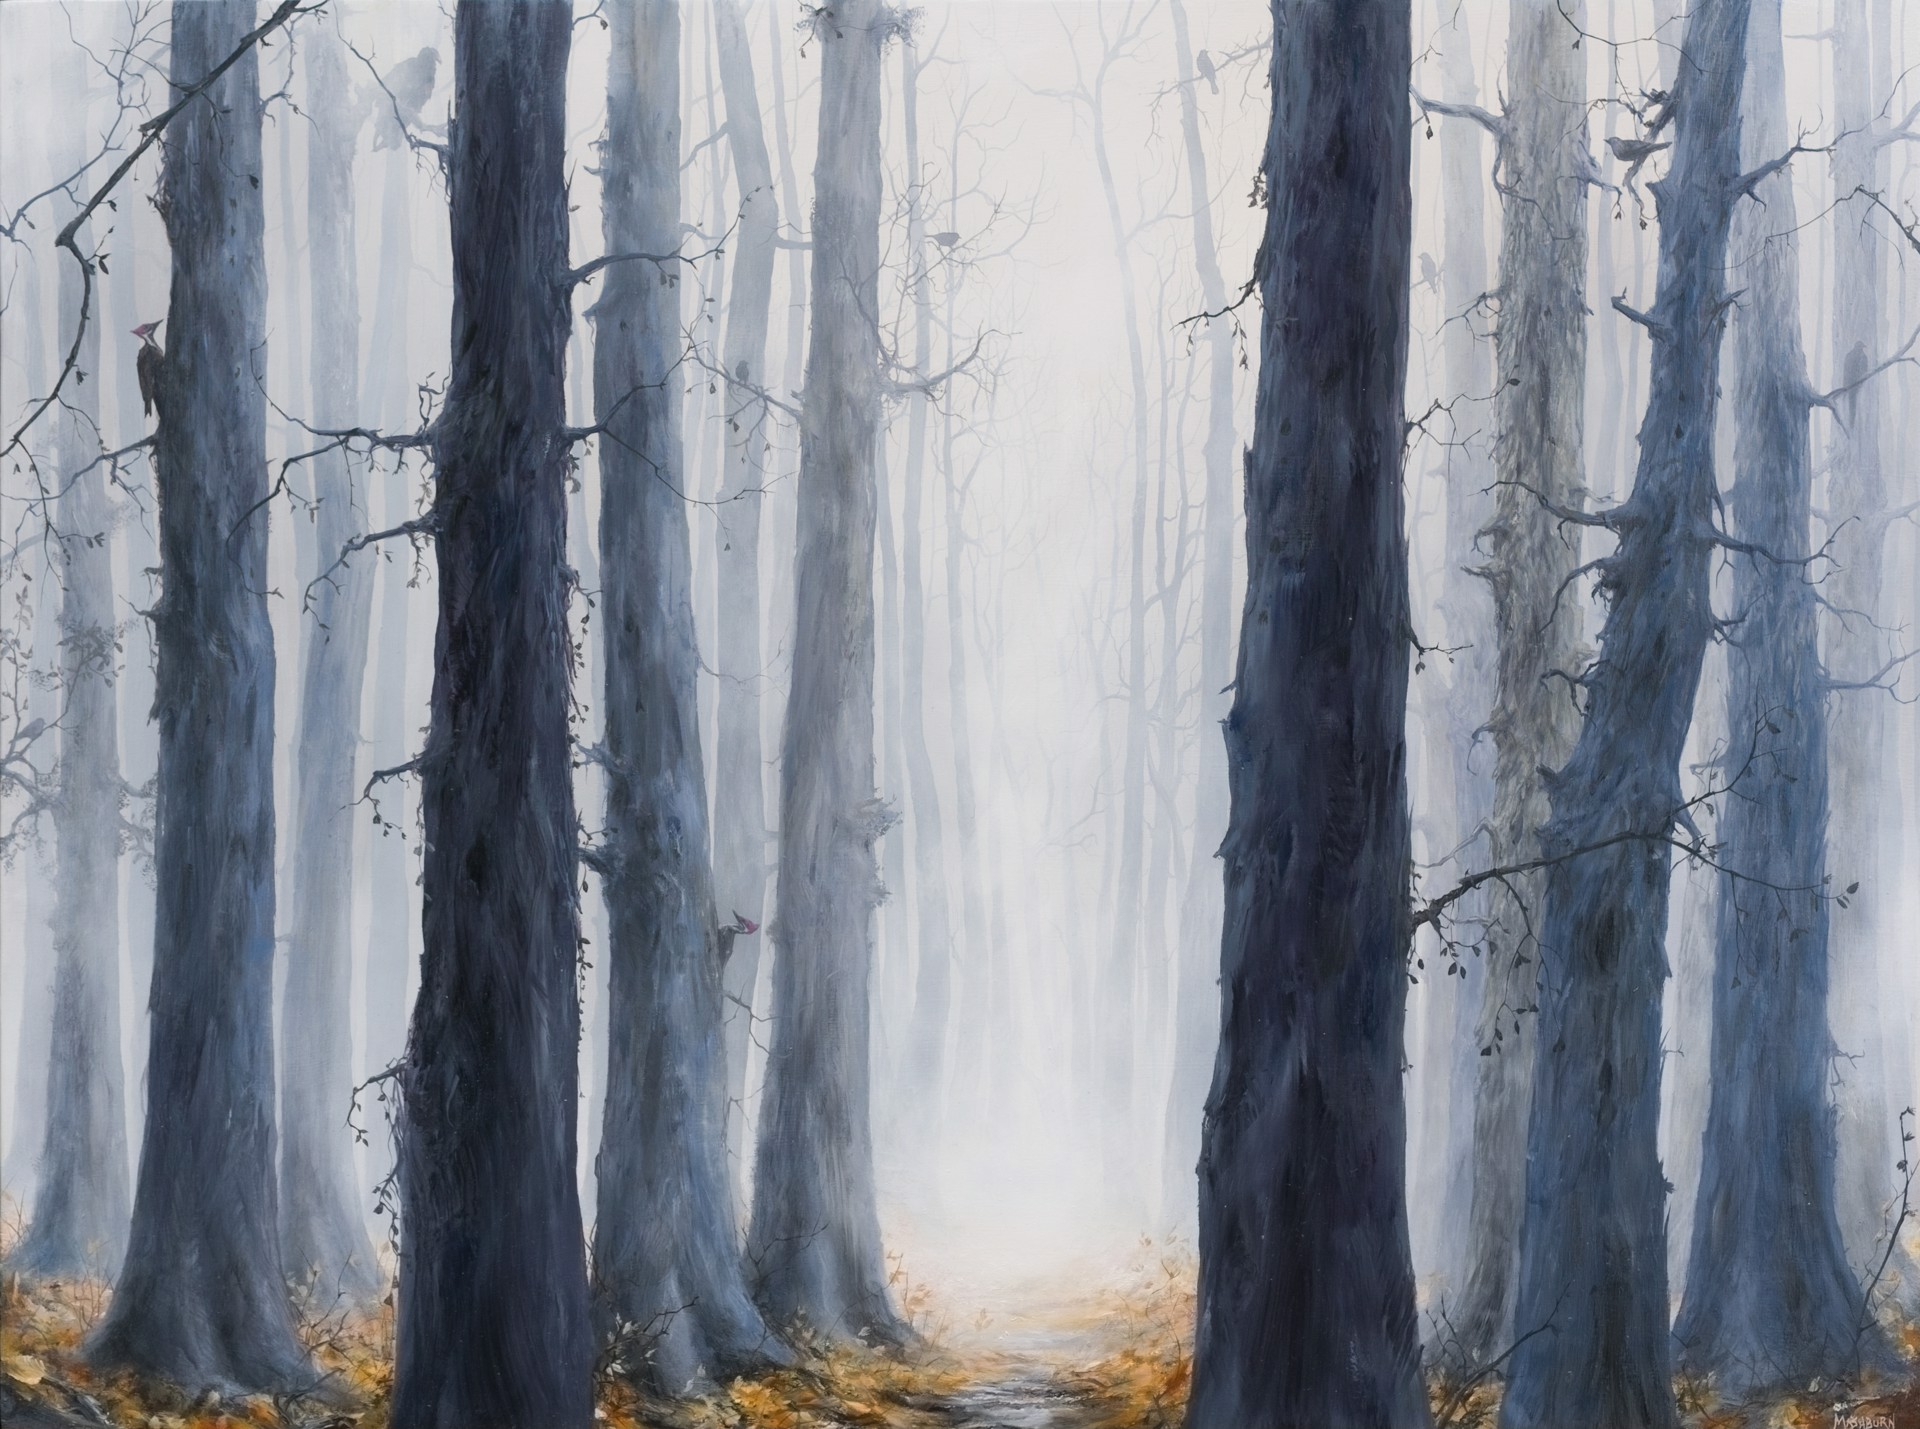 Corridor by Brian Mashburn